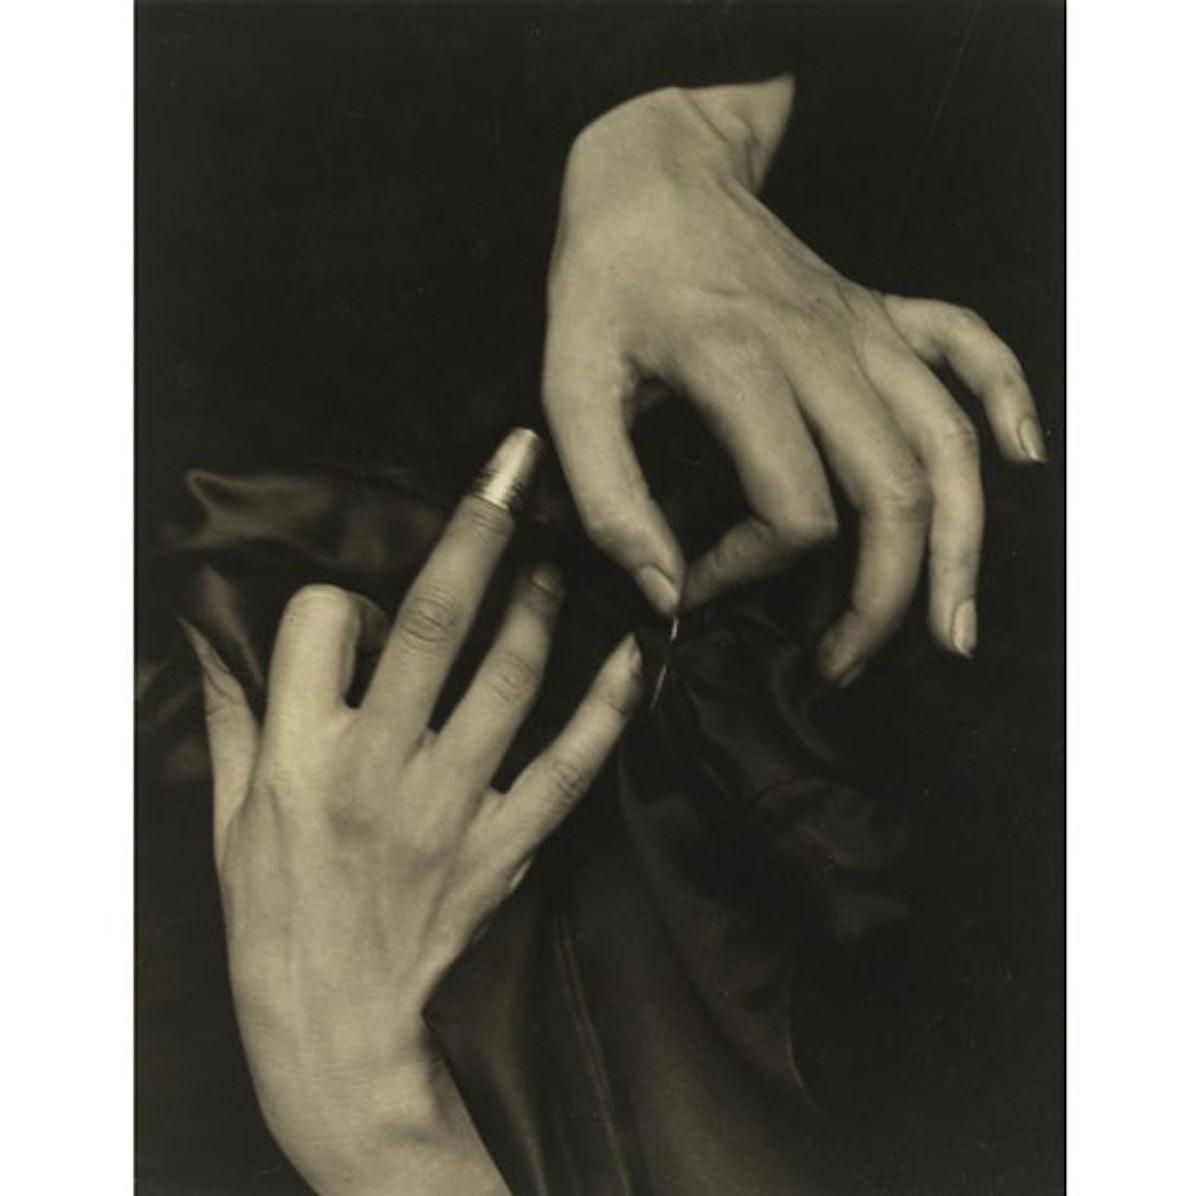 8886-Stieglitz%2C-Hands-with-Thimble.jpg